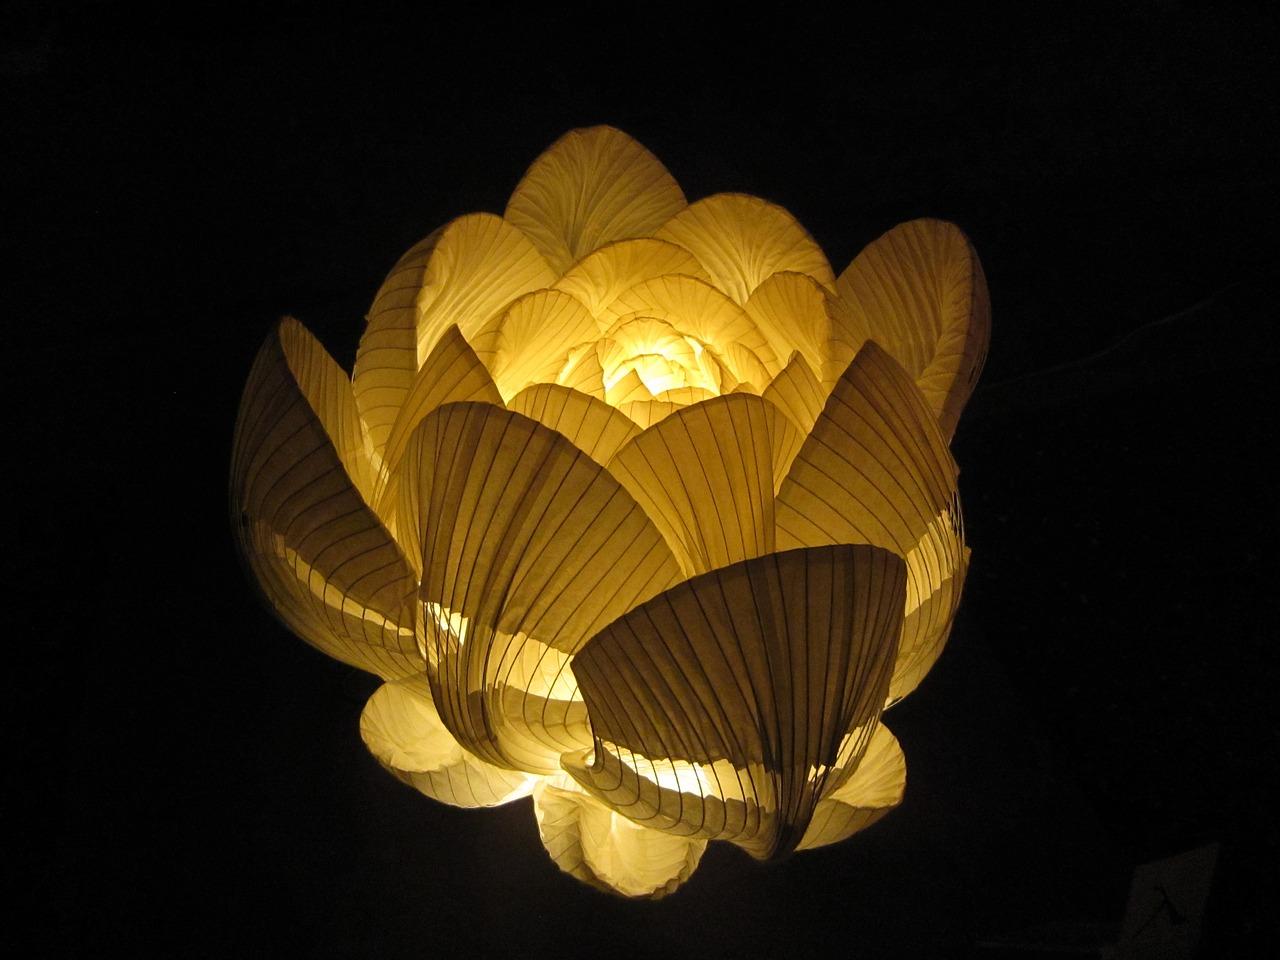 Lampadari Di Carta Per Bambini : Lampadari e illuminazione per la casa conforama